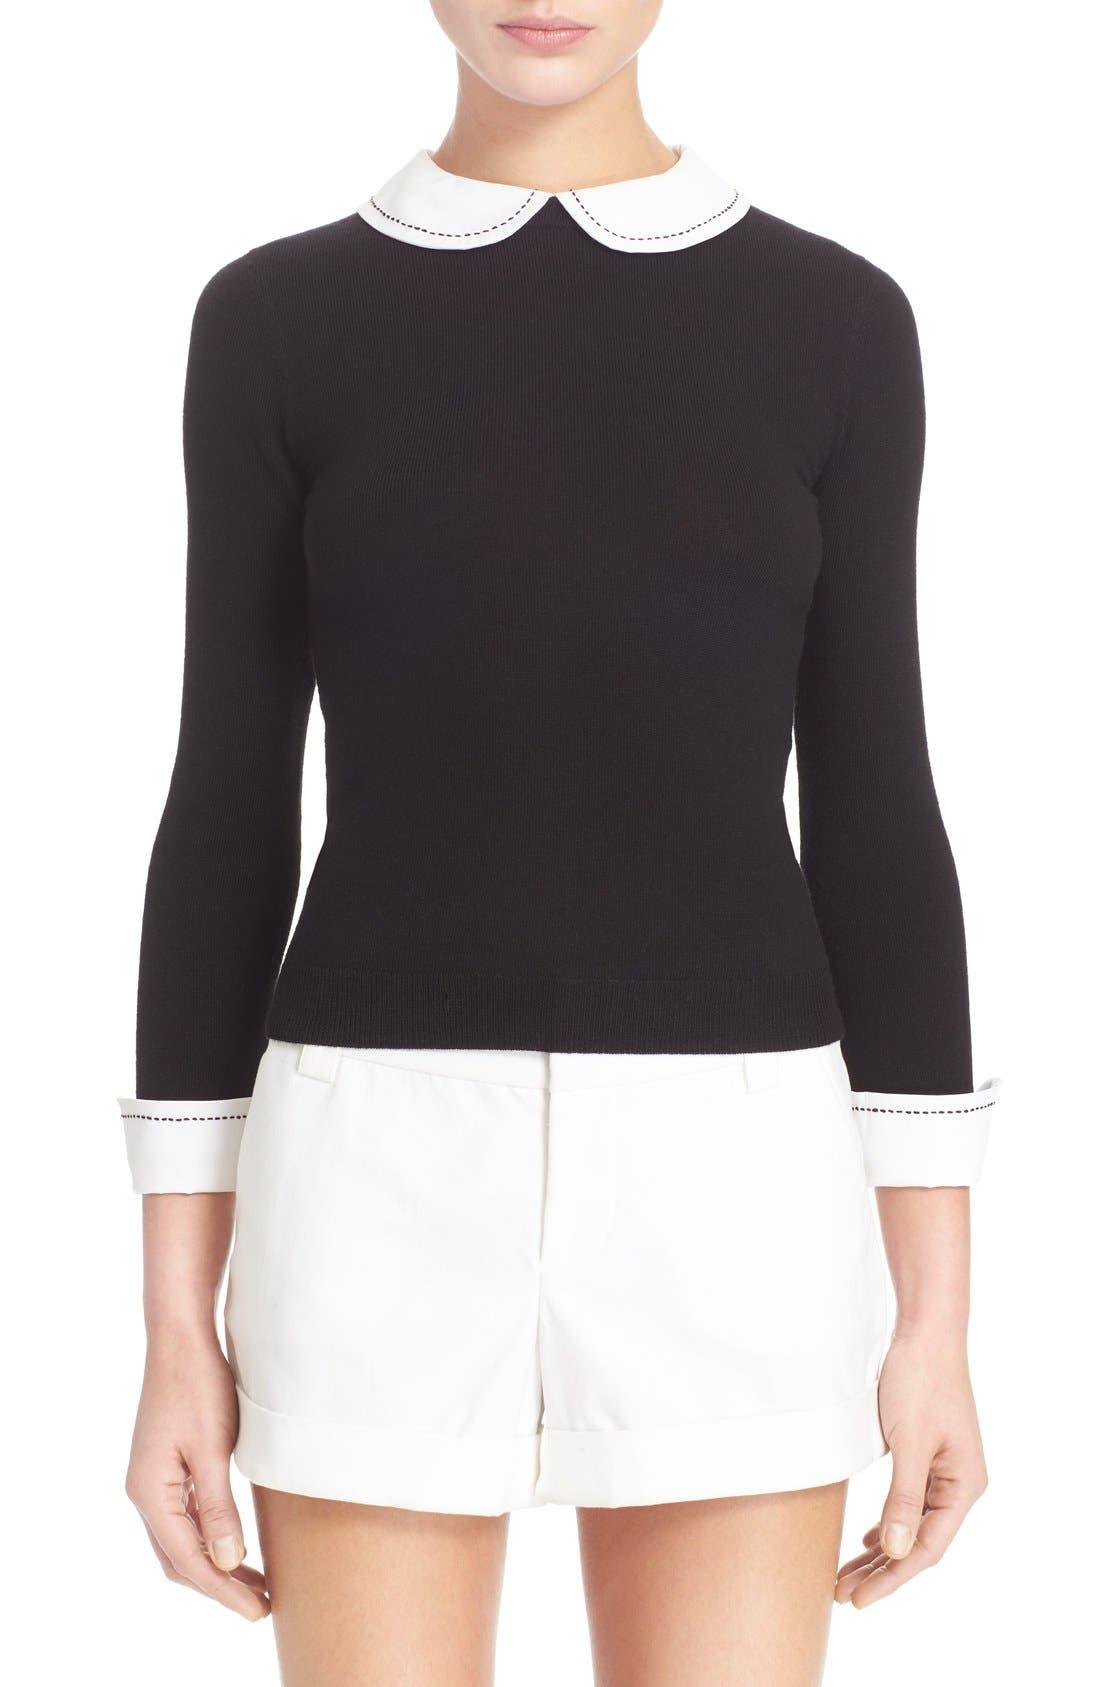 Alternate Image 1 Selected - Alice + Olivia 'Porla' Embellished Collar Wool Pullover